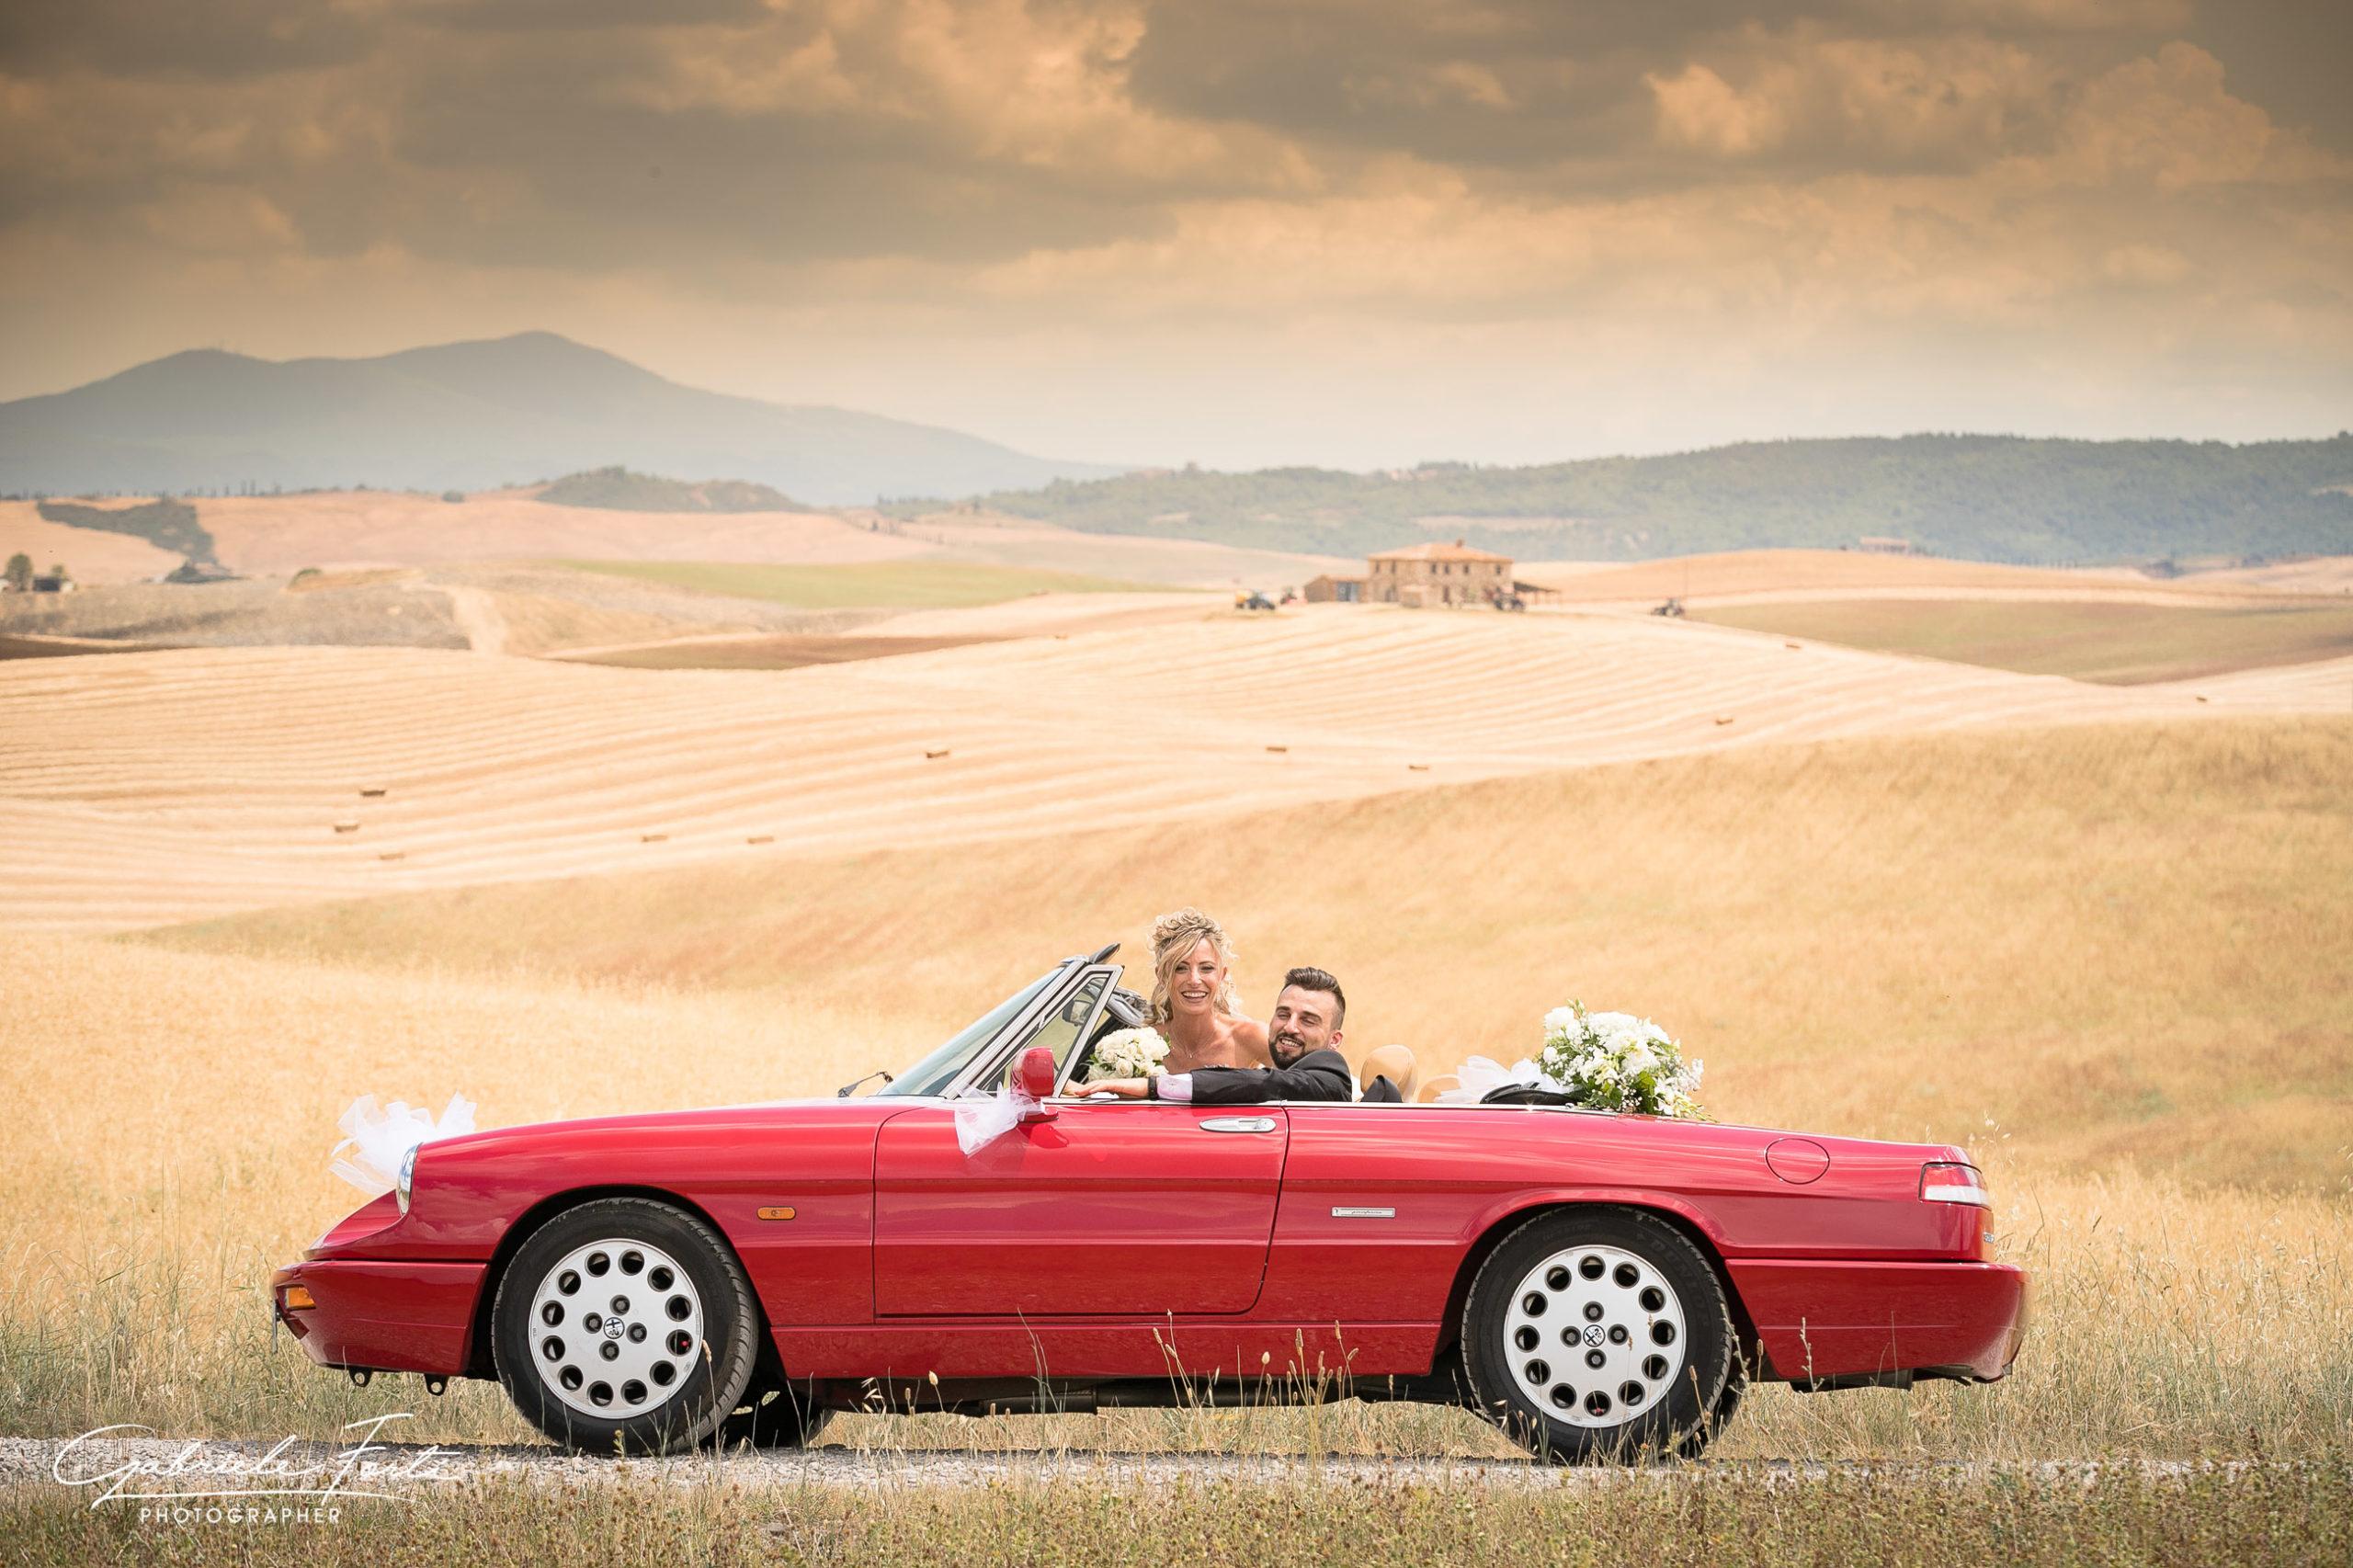 abbadia-san-salvatore-wedding-matrimonio-piancastagnaio-fotografo-foto-forti-gabriele-12